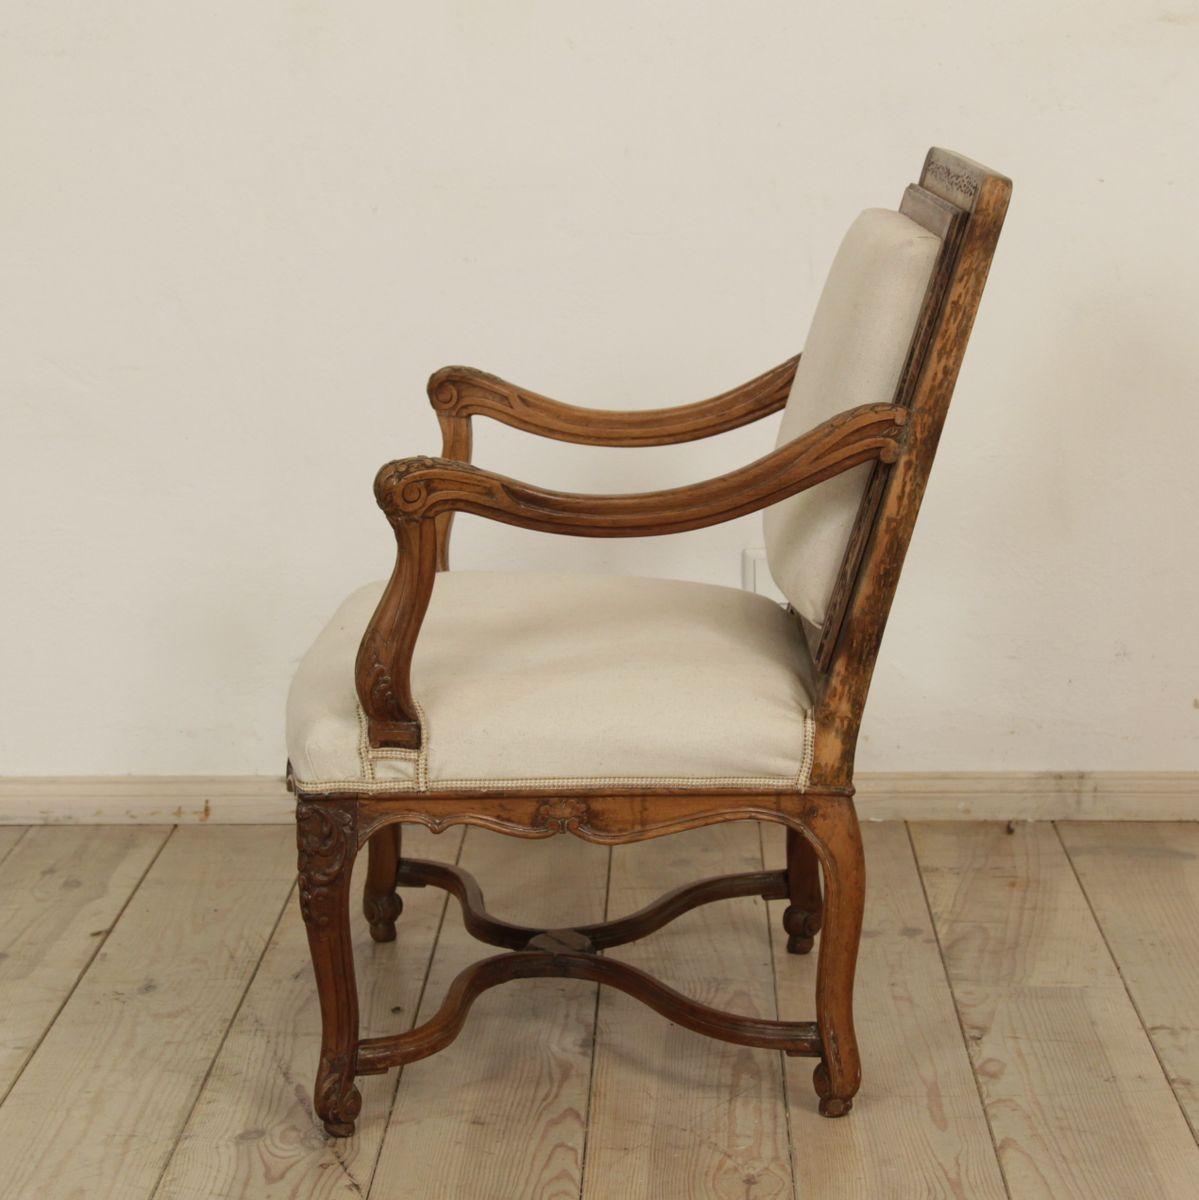 barocker armlehnstuhl frankreich bei pamono kaufen. Black Bedroom Furniture Sets. Home Design Ideas